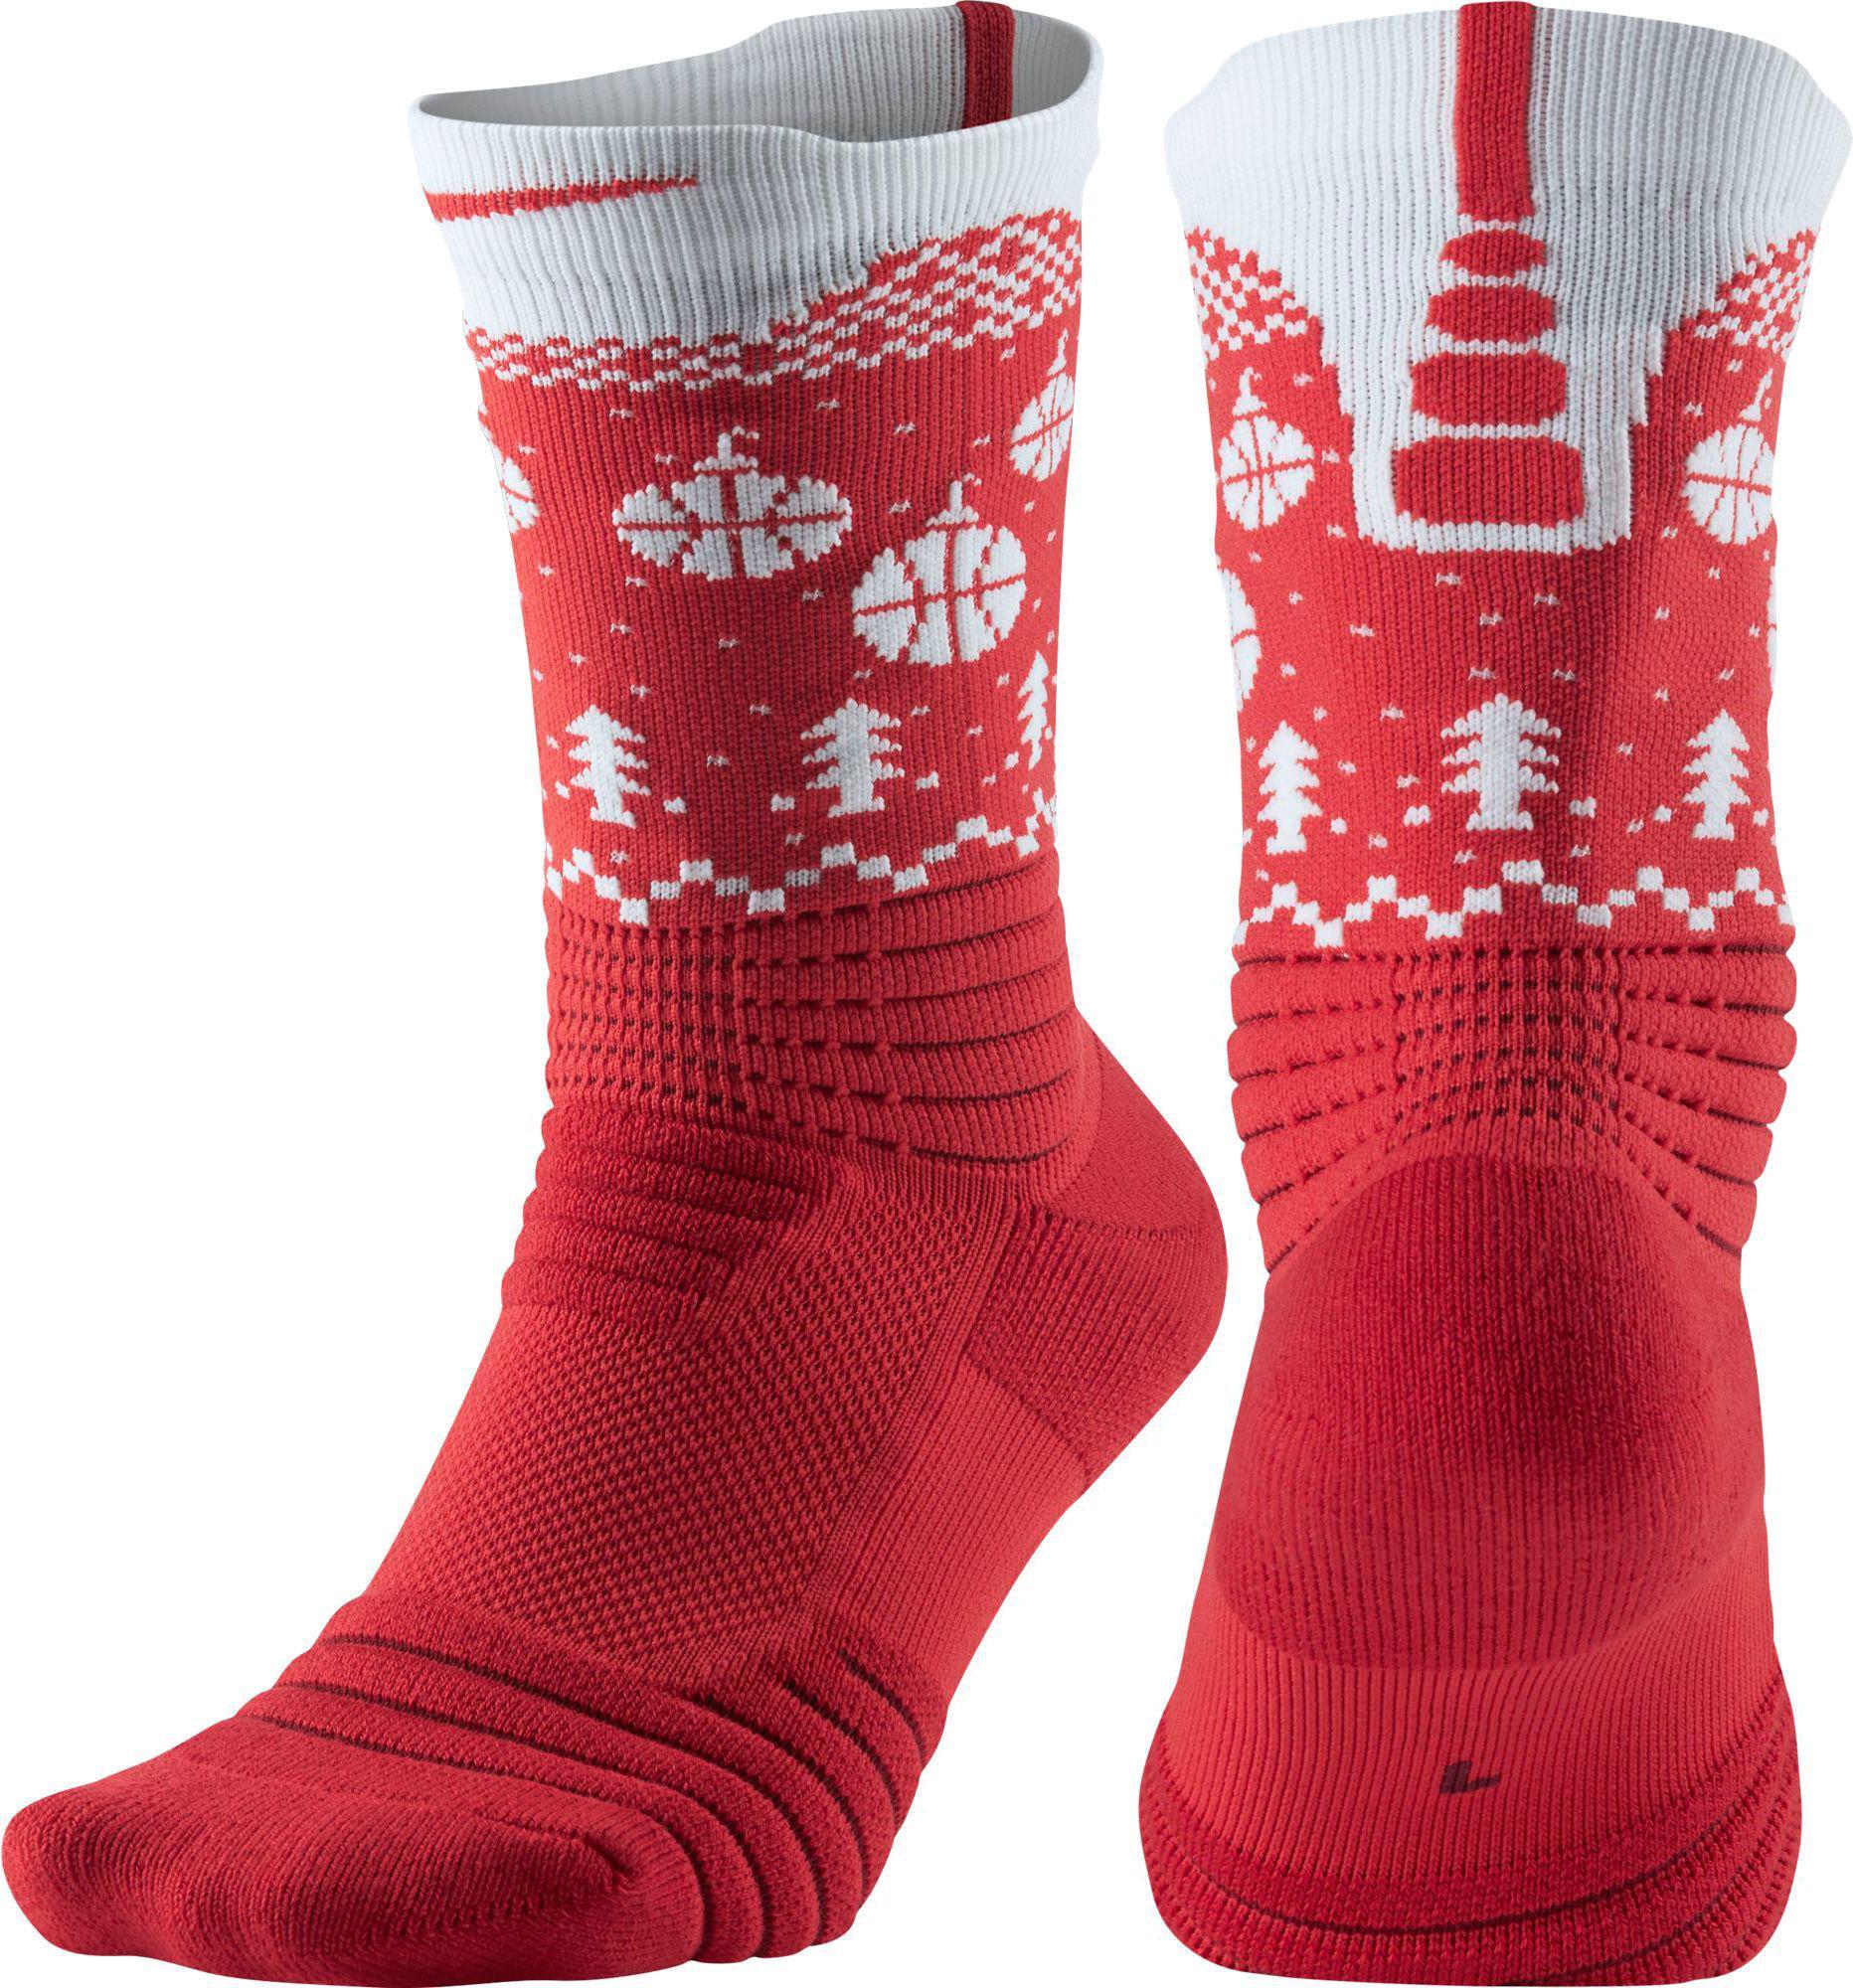 Lyst - Nike Elite Versatility Holiday Crew Socks in Red ...